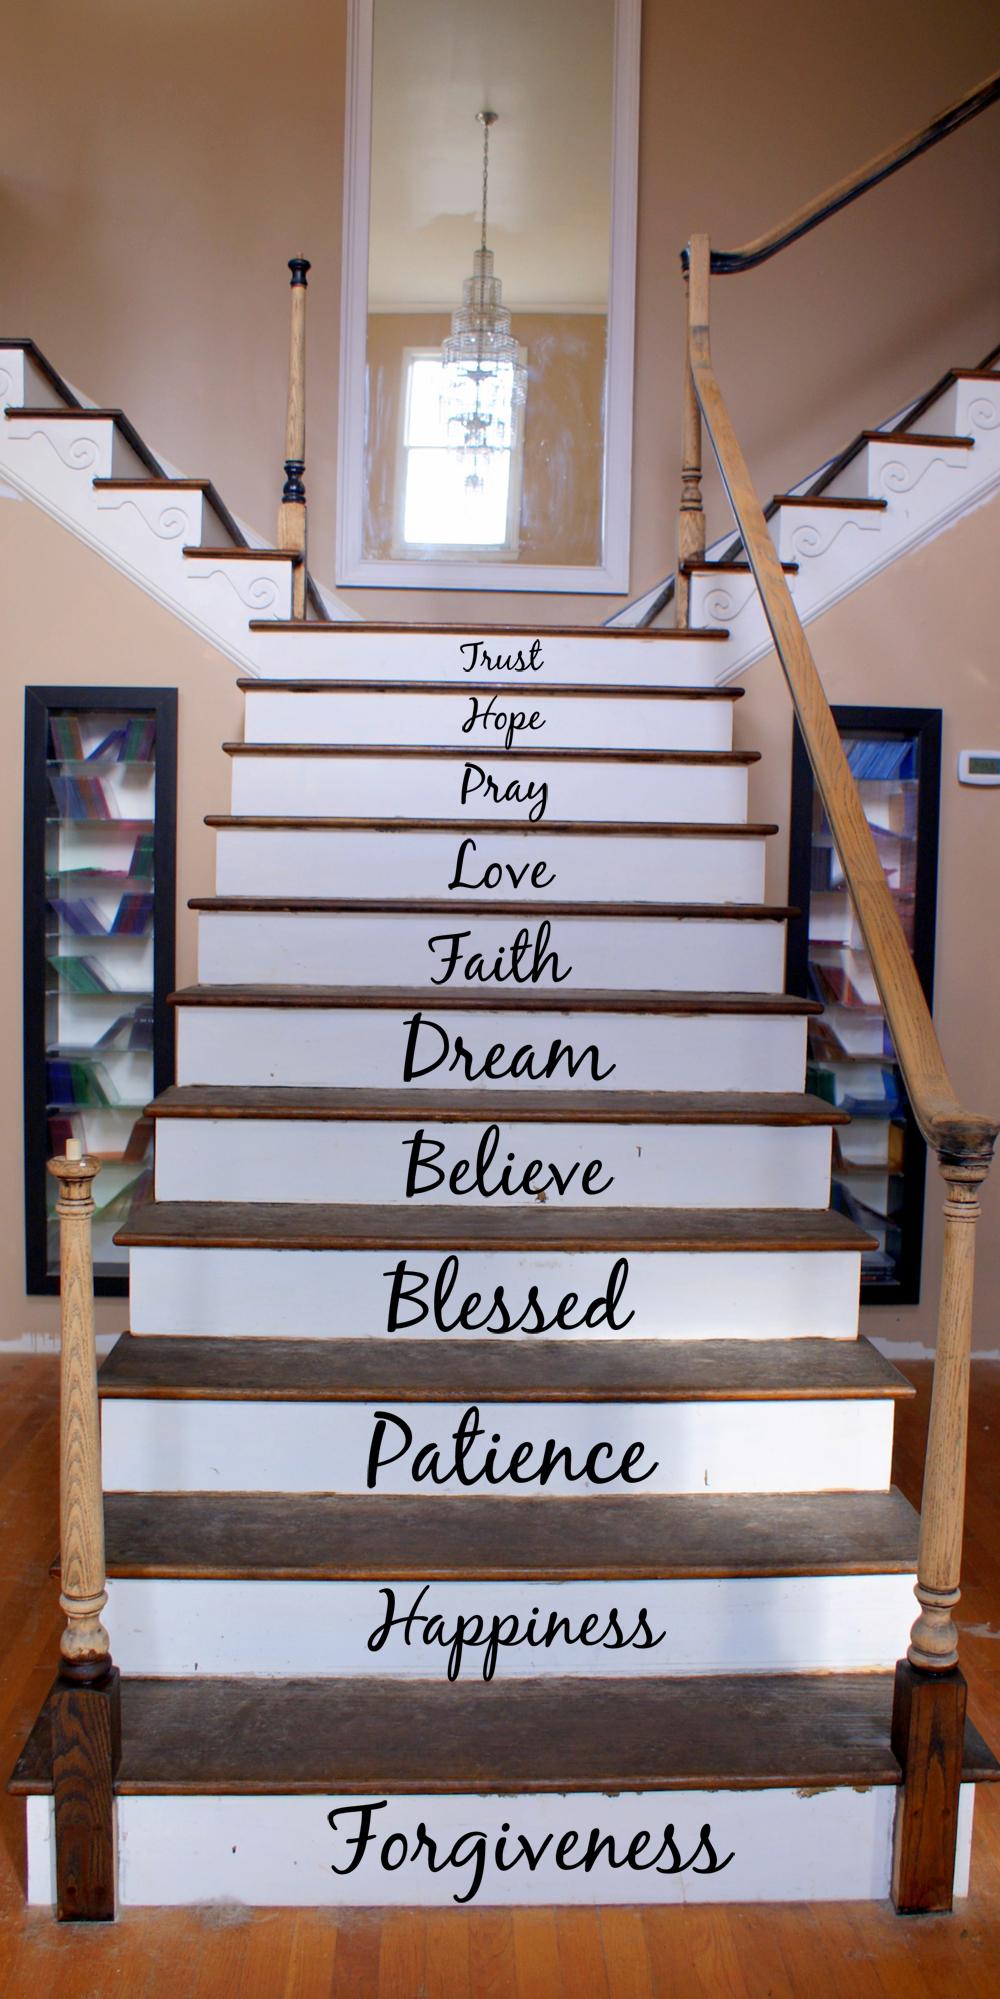 Cursive Inspirational Words Wall Decal